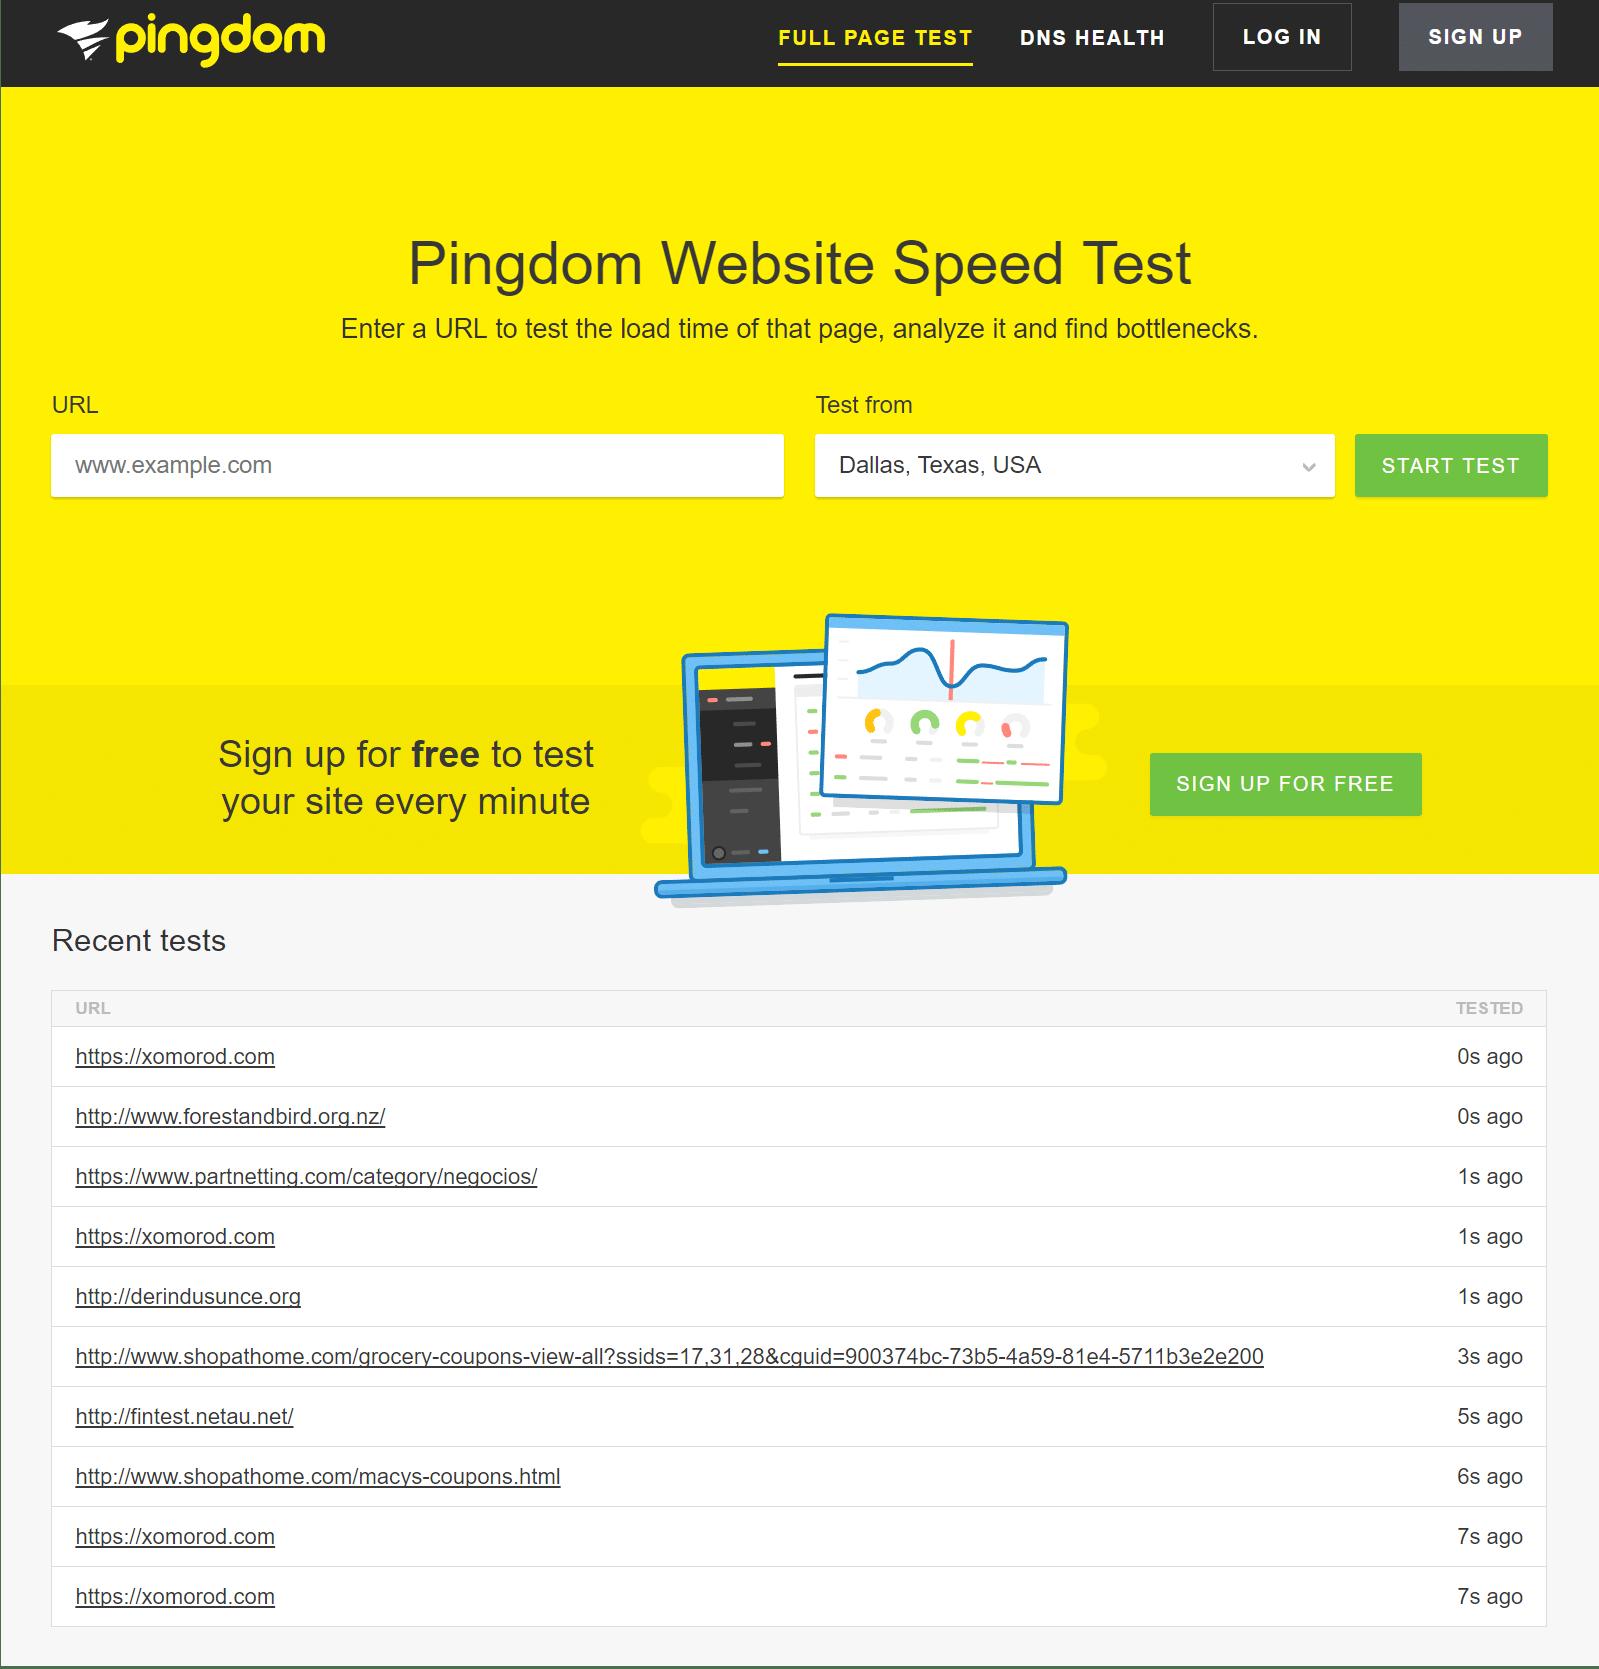 pingdom website speed test tool